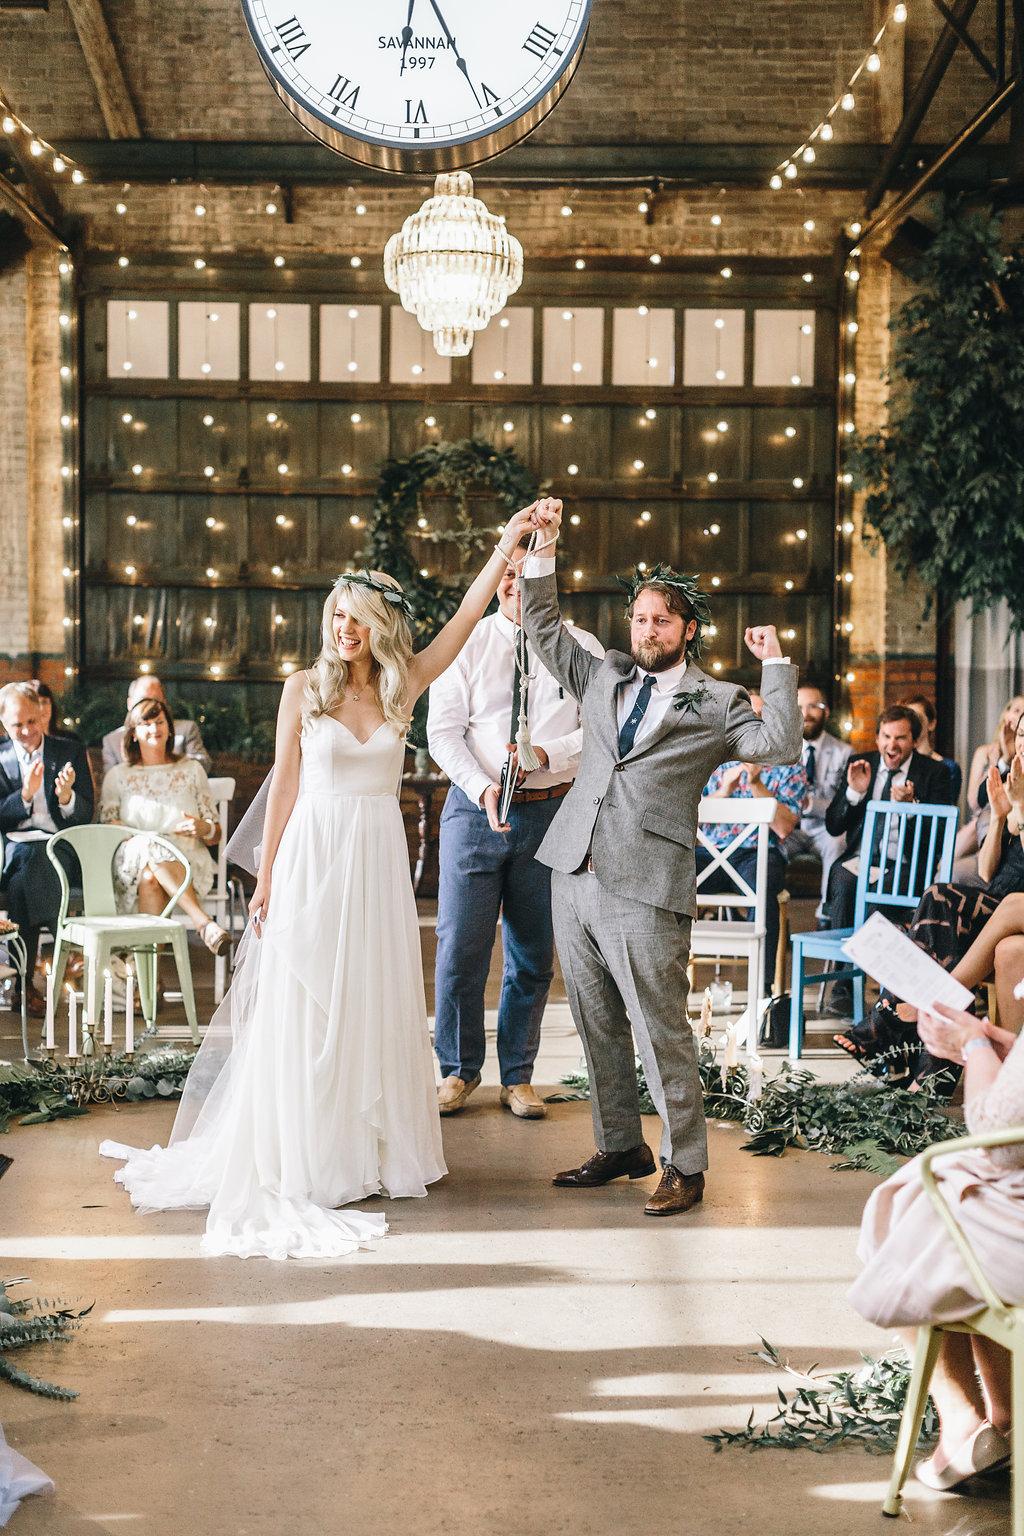 shannon-britt-mackensey-alexander-photography-green-wedding-shoes-ivory-and-beau-bridal-boutique-savannah-wedding-planner-savannah-bridal-boutique-savannah-wedding-dresses-savannah-florist-summer-solstice-wedding-boho-soho-south-cafe-wedding-55.jpg